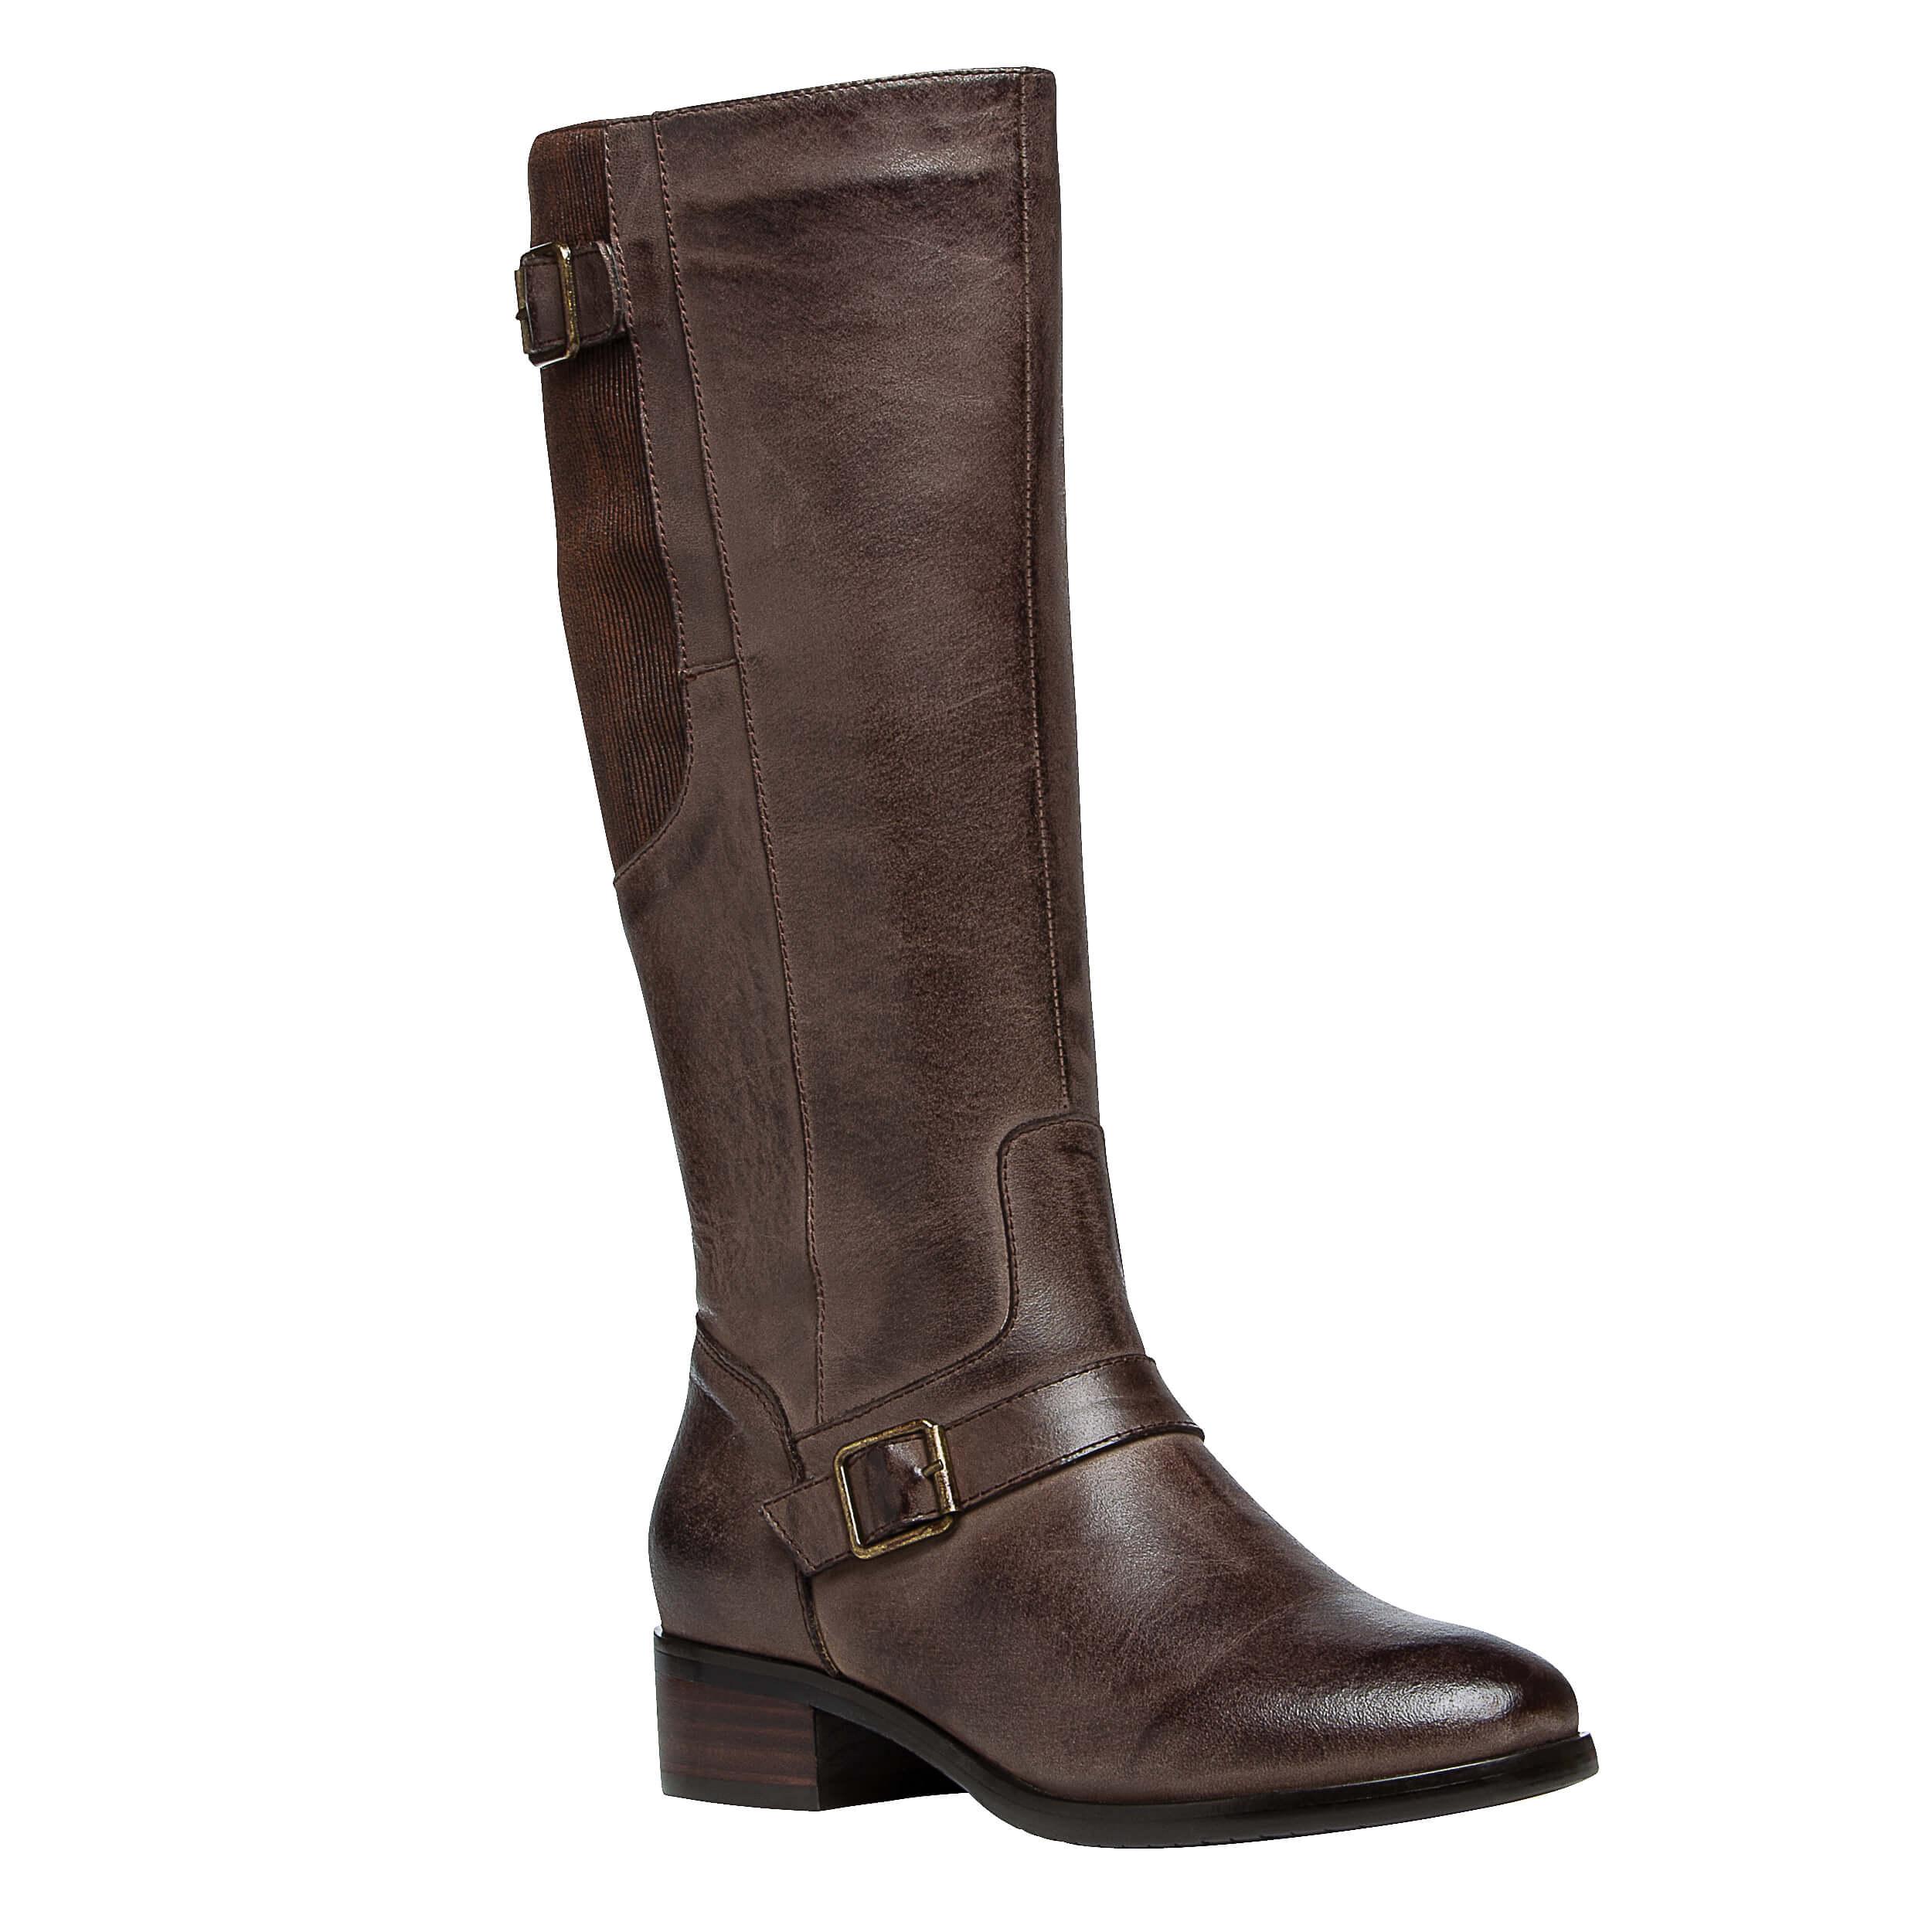 boots winter brands zena shop blondo black comfortable comforter fashion on cloud walking a for